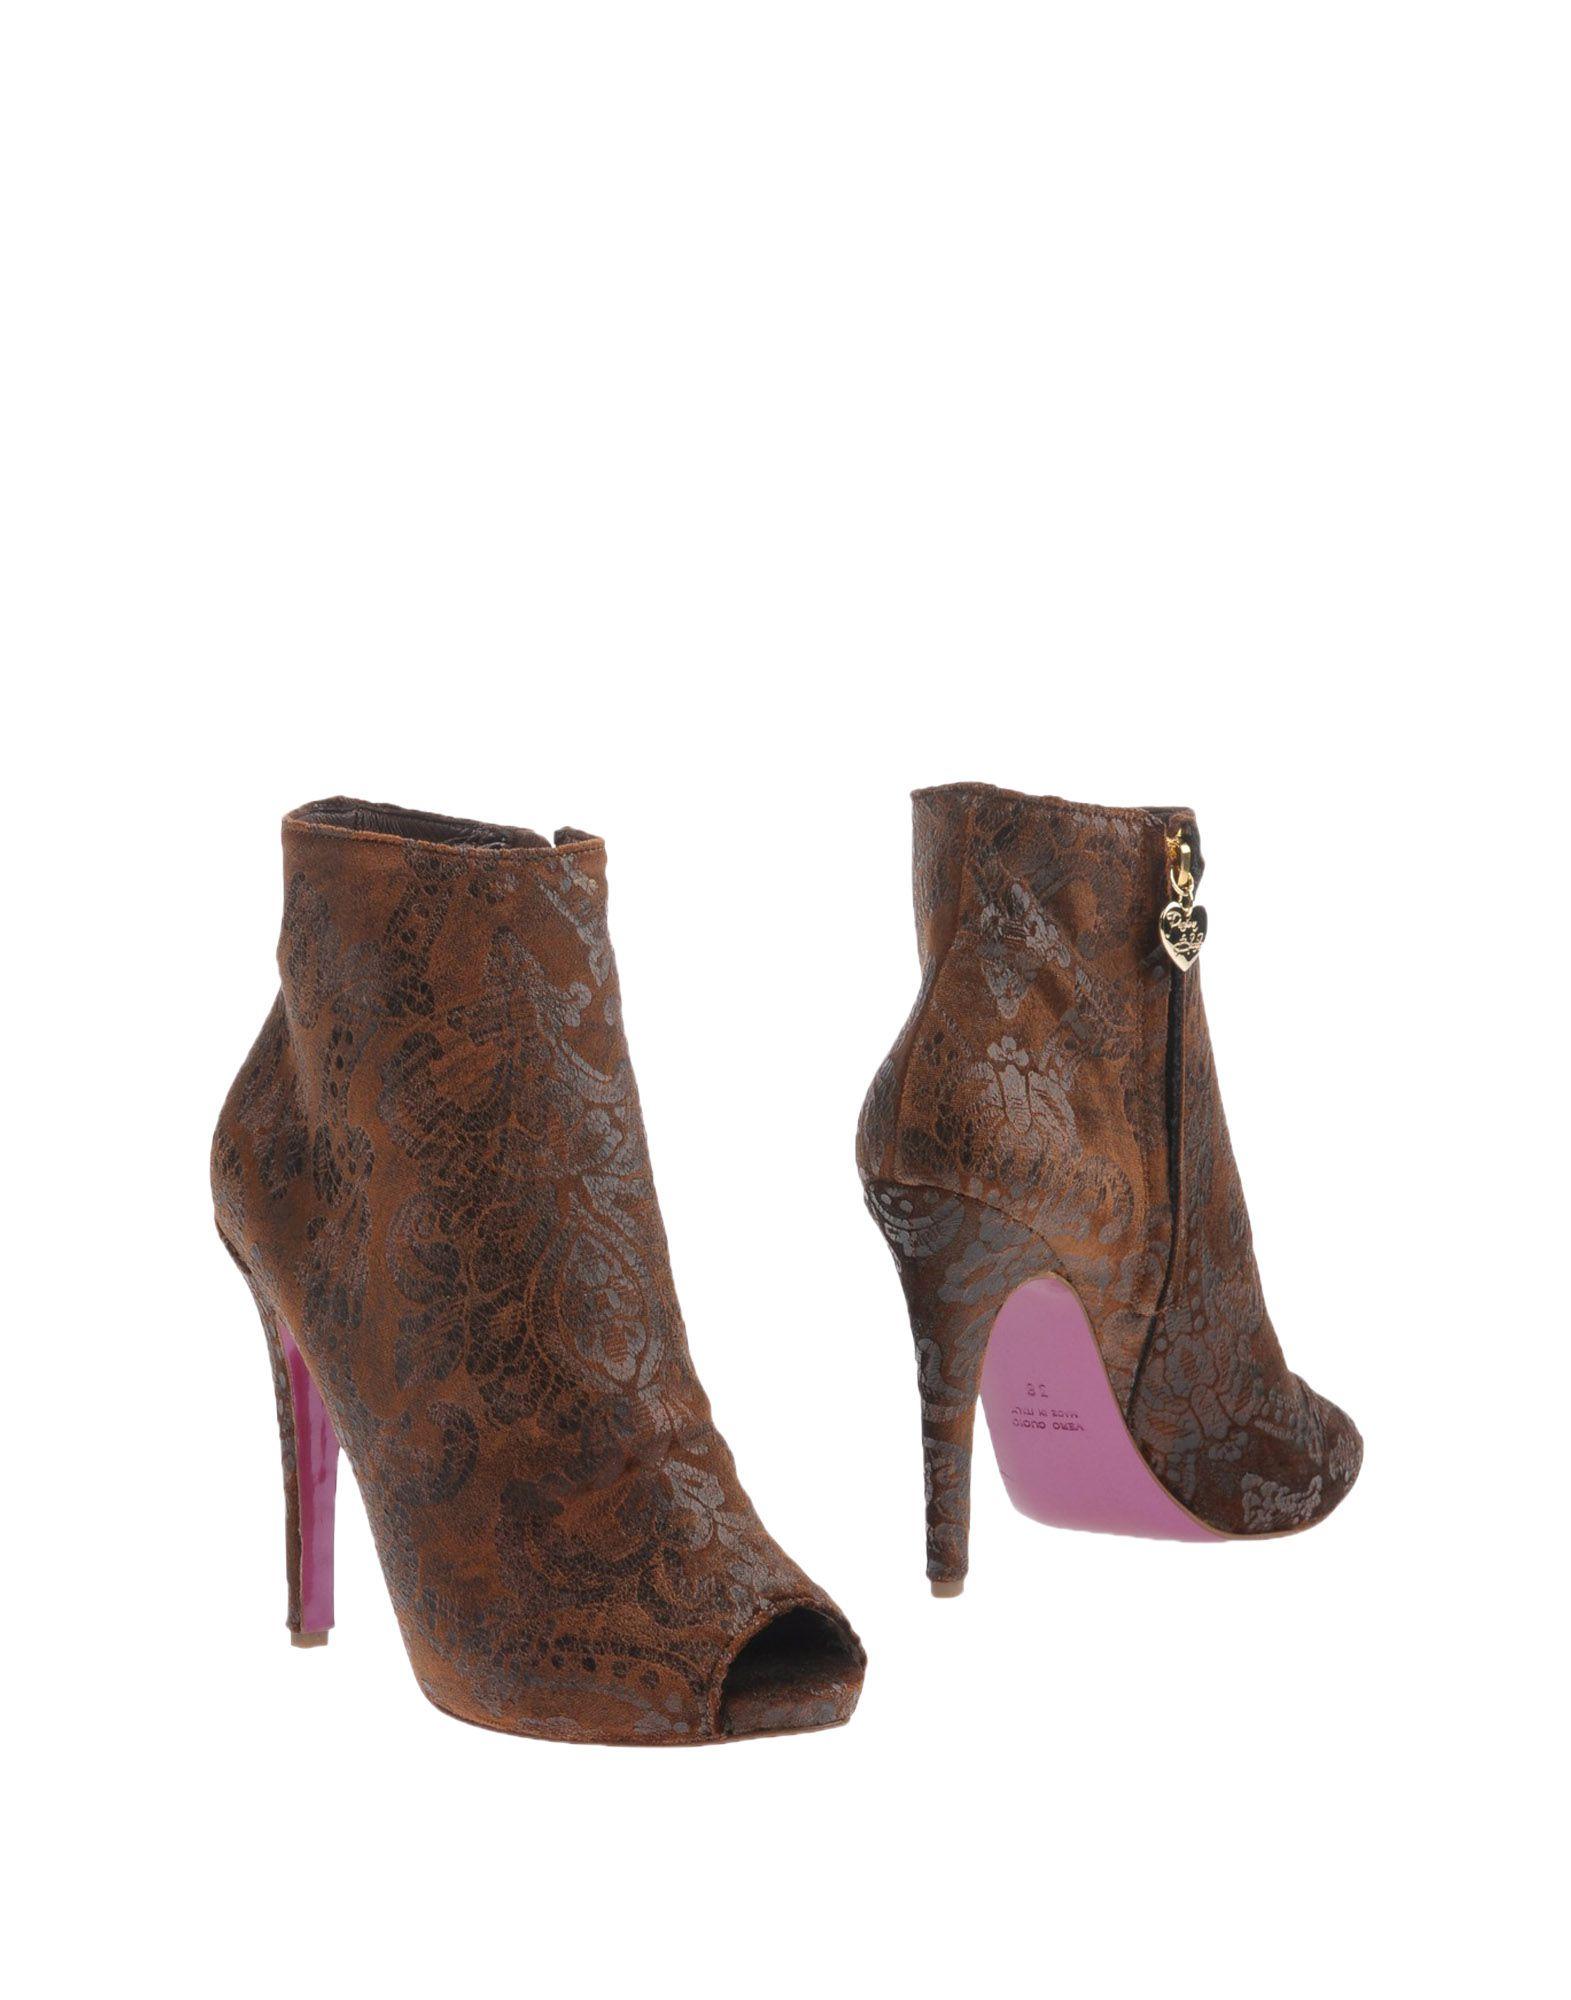 Rabatt Schuhe Passion Blanche Stiefelette Damen  11217439SK